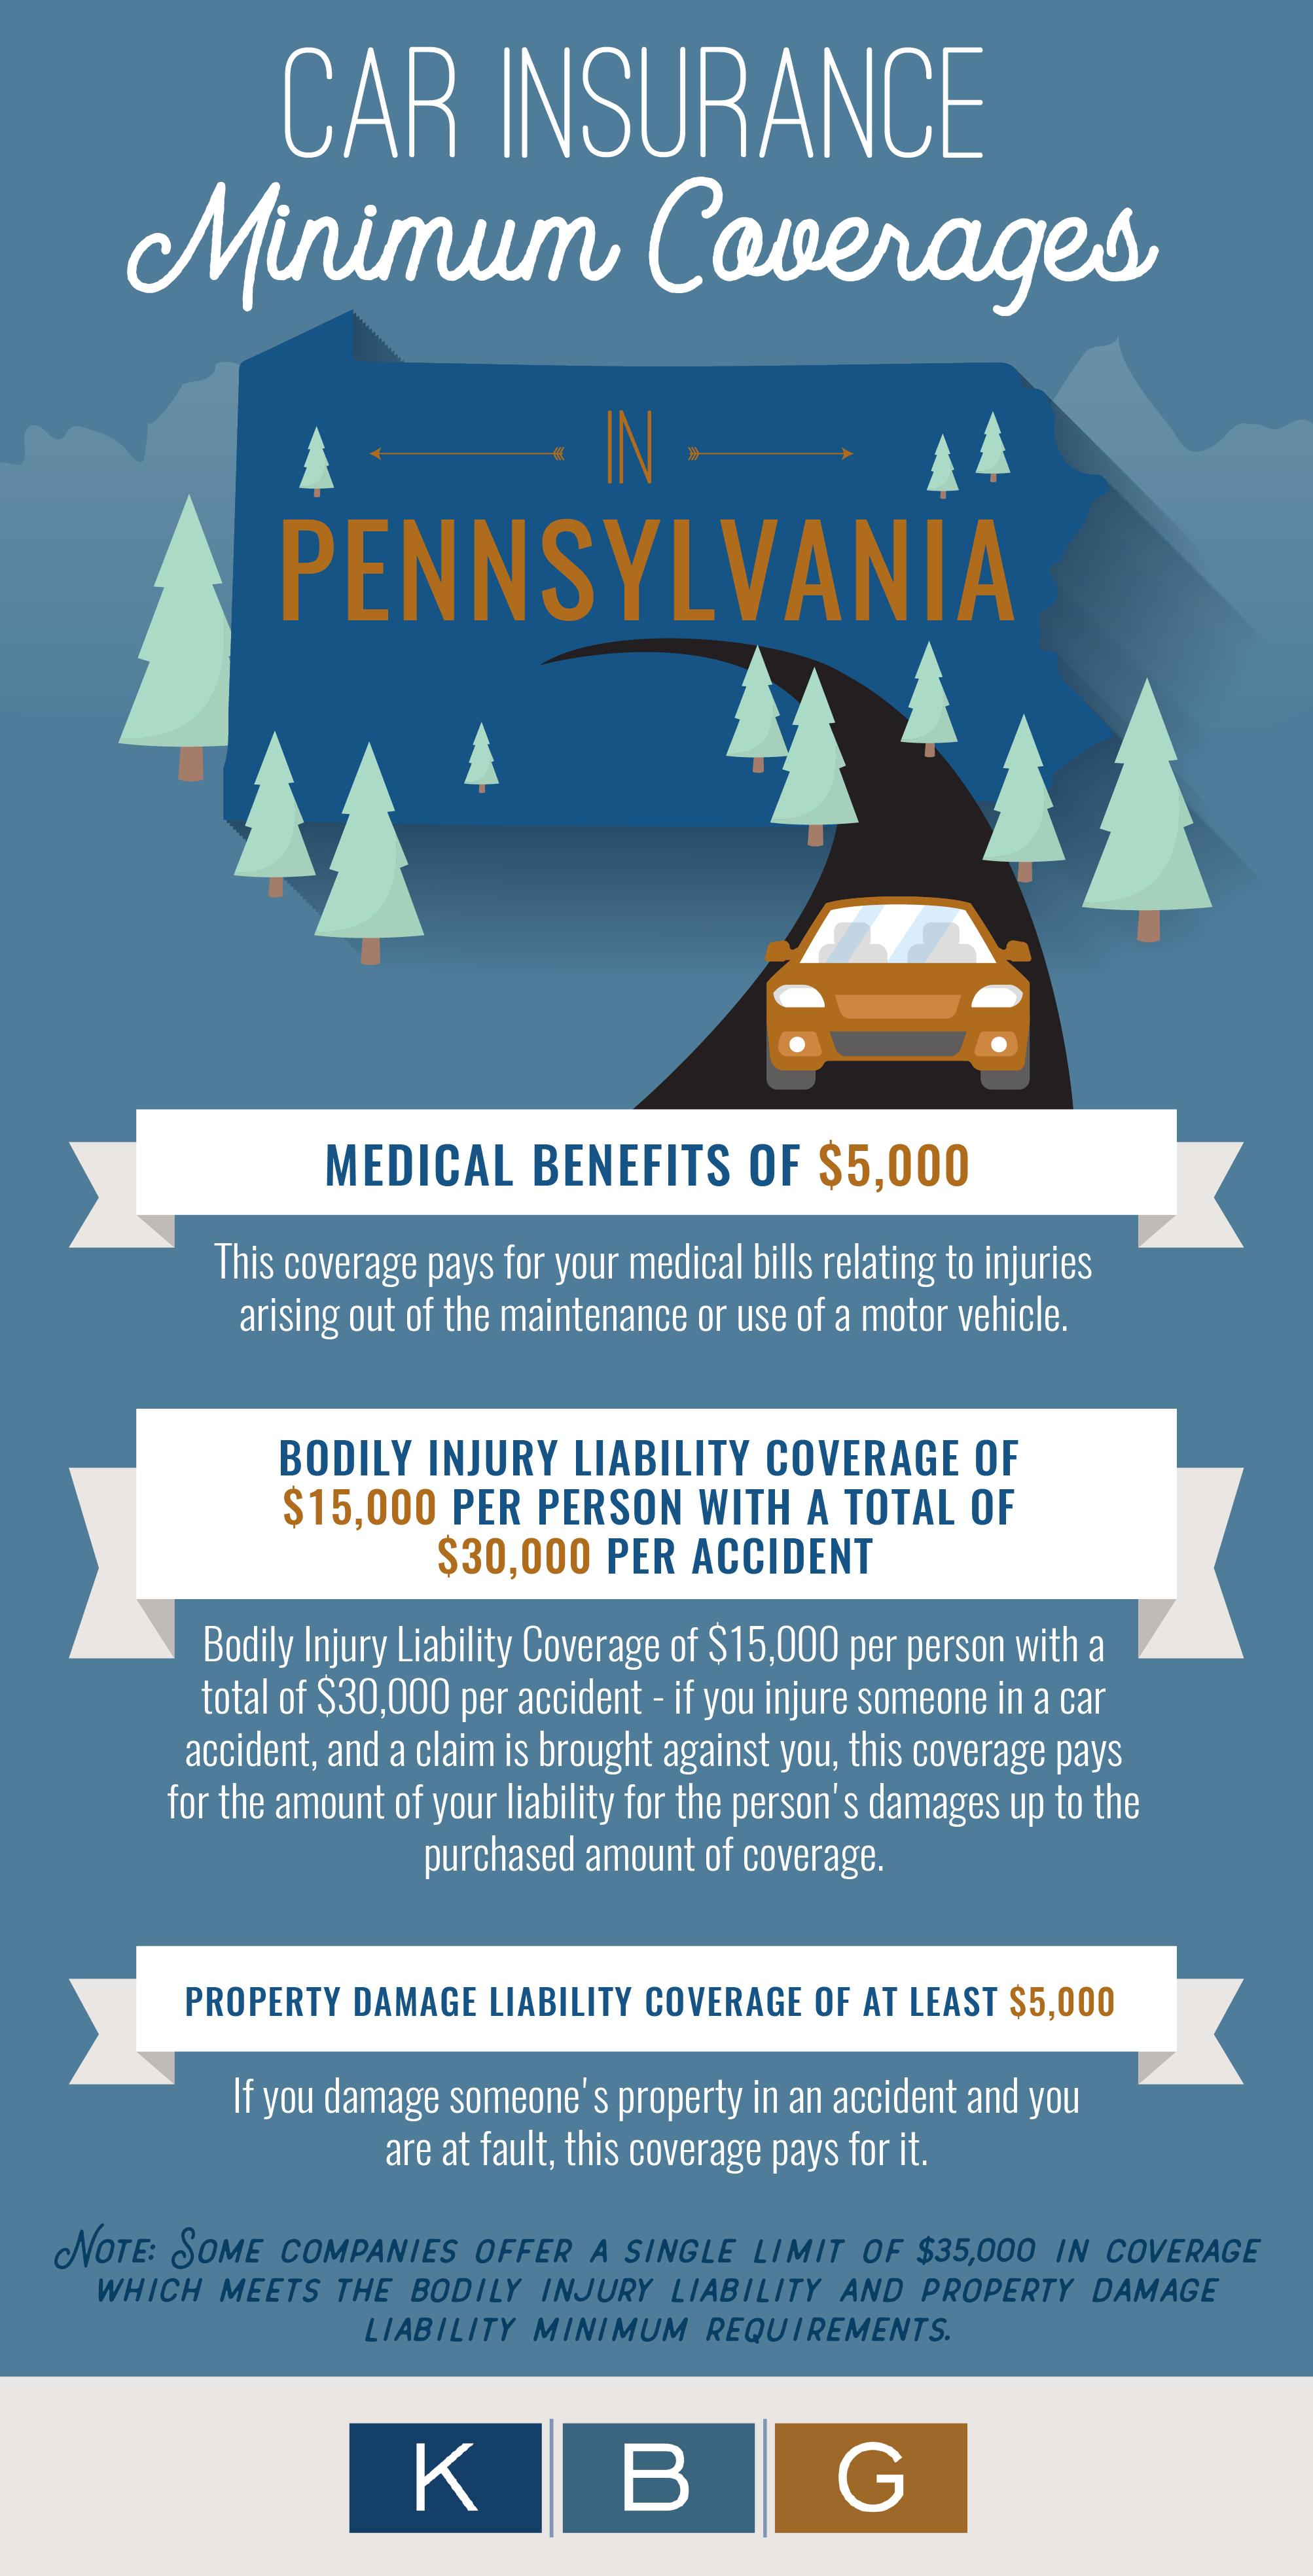 Insurance Basics Car Insurance Car Insurance Tips Insurance